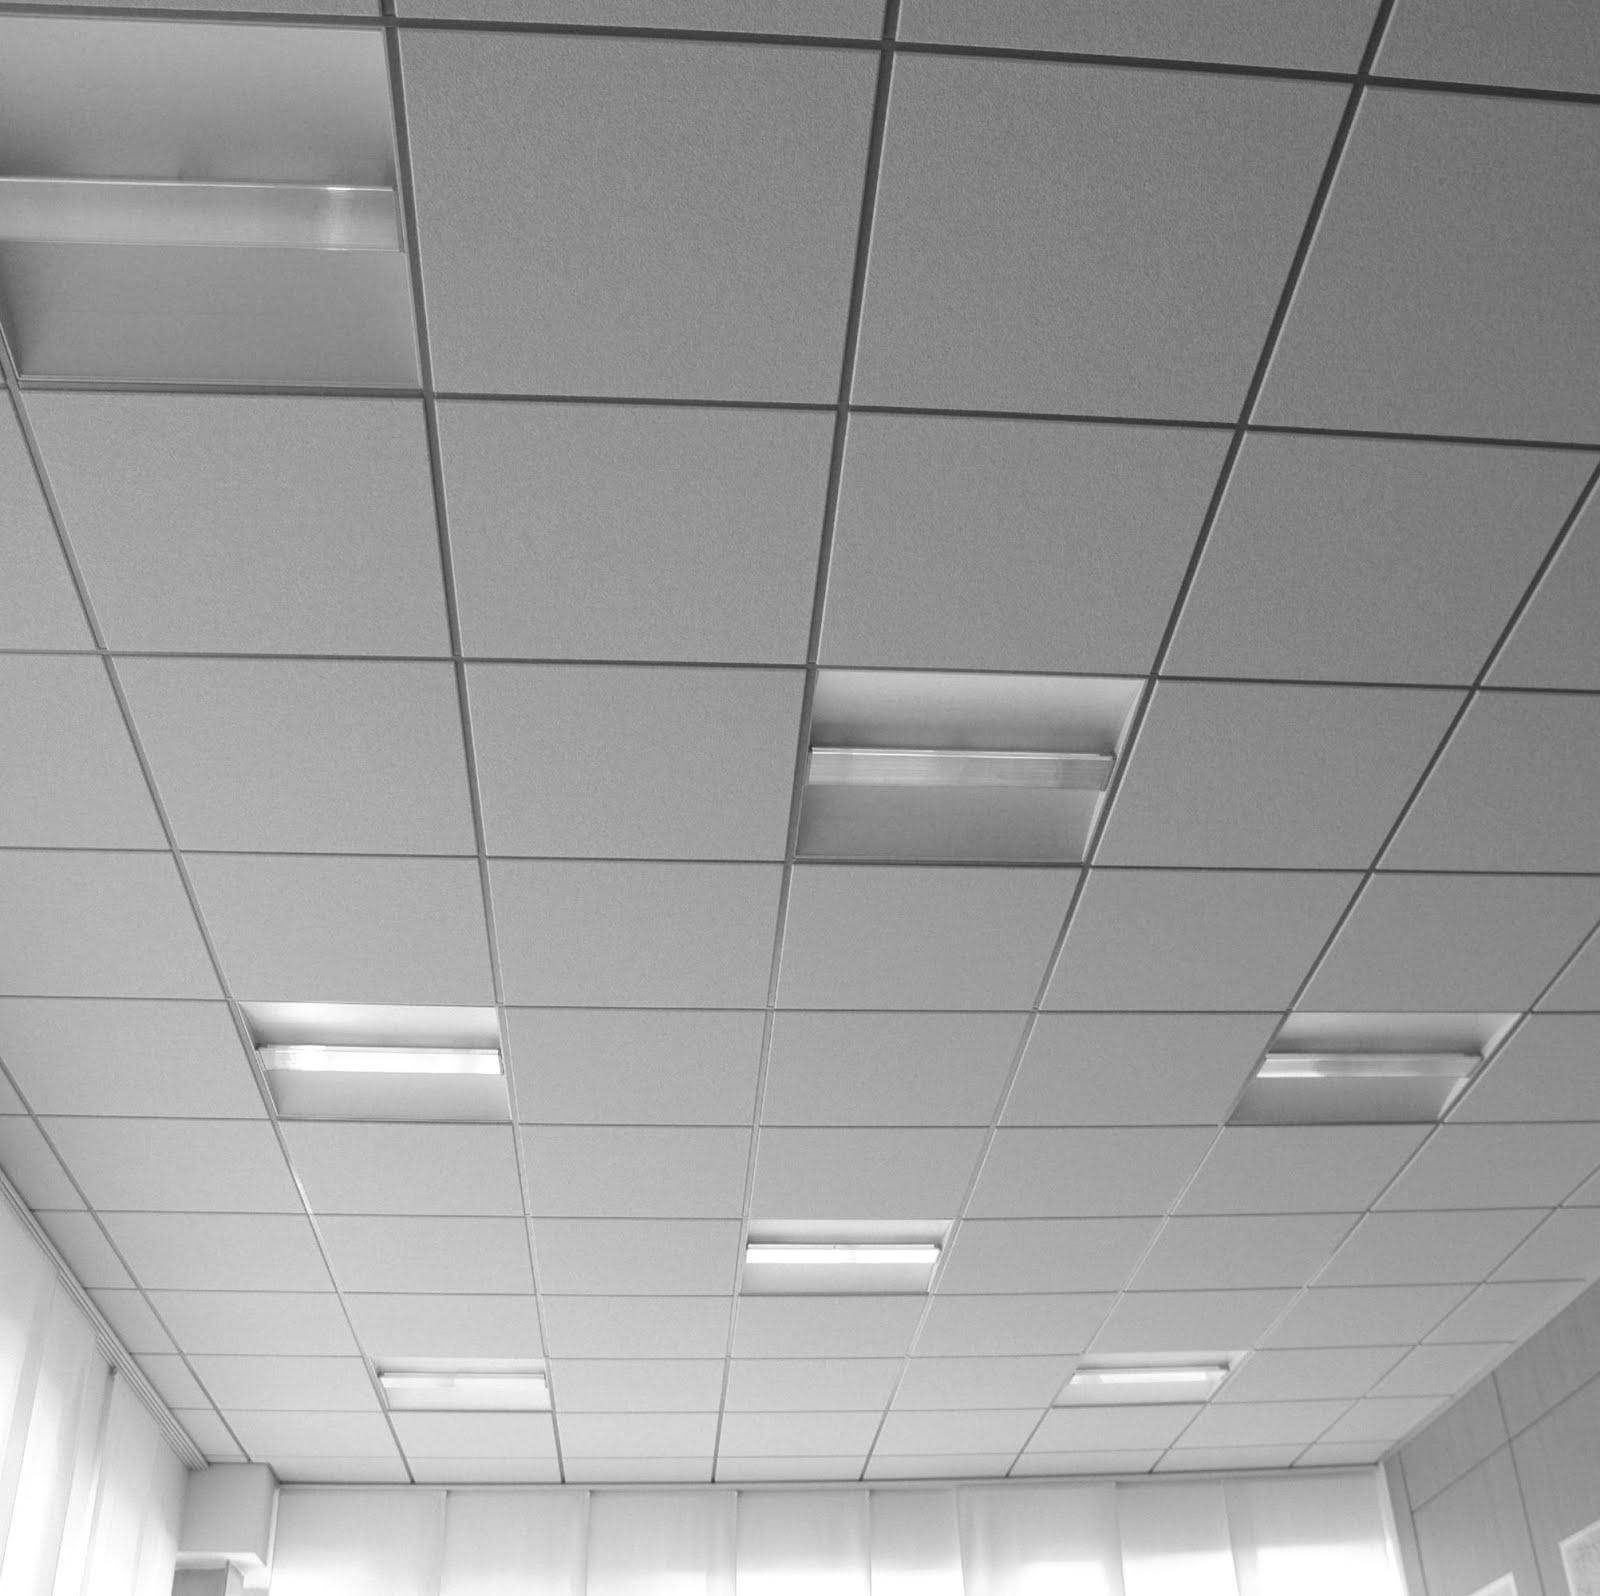 Basic Functions Of False Ceiling